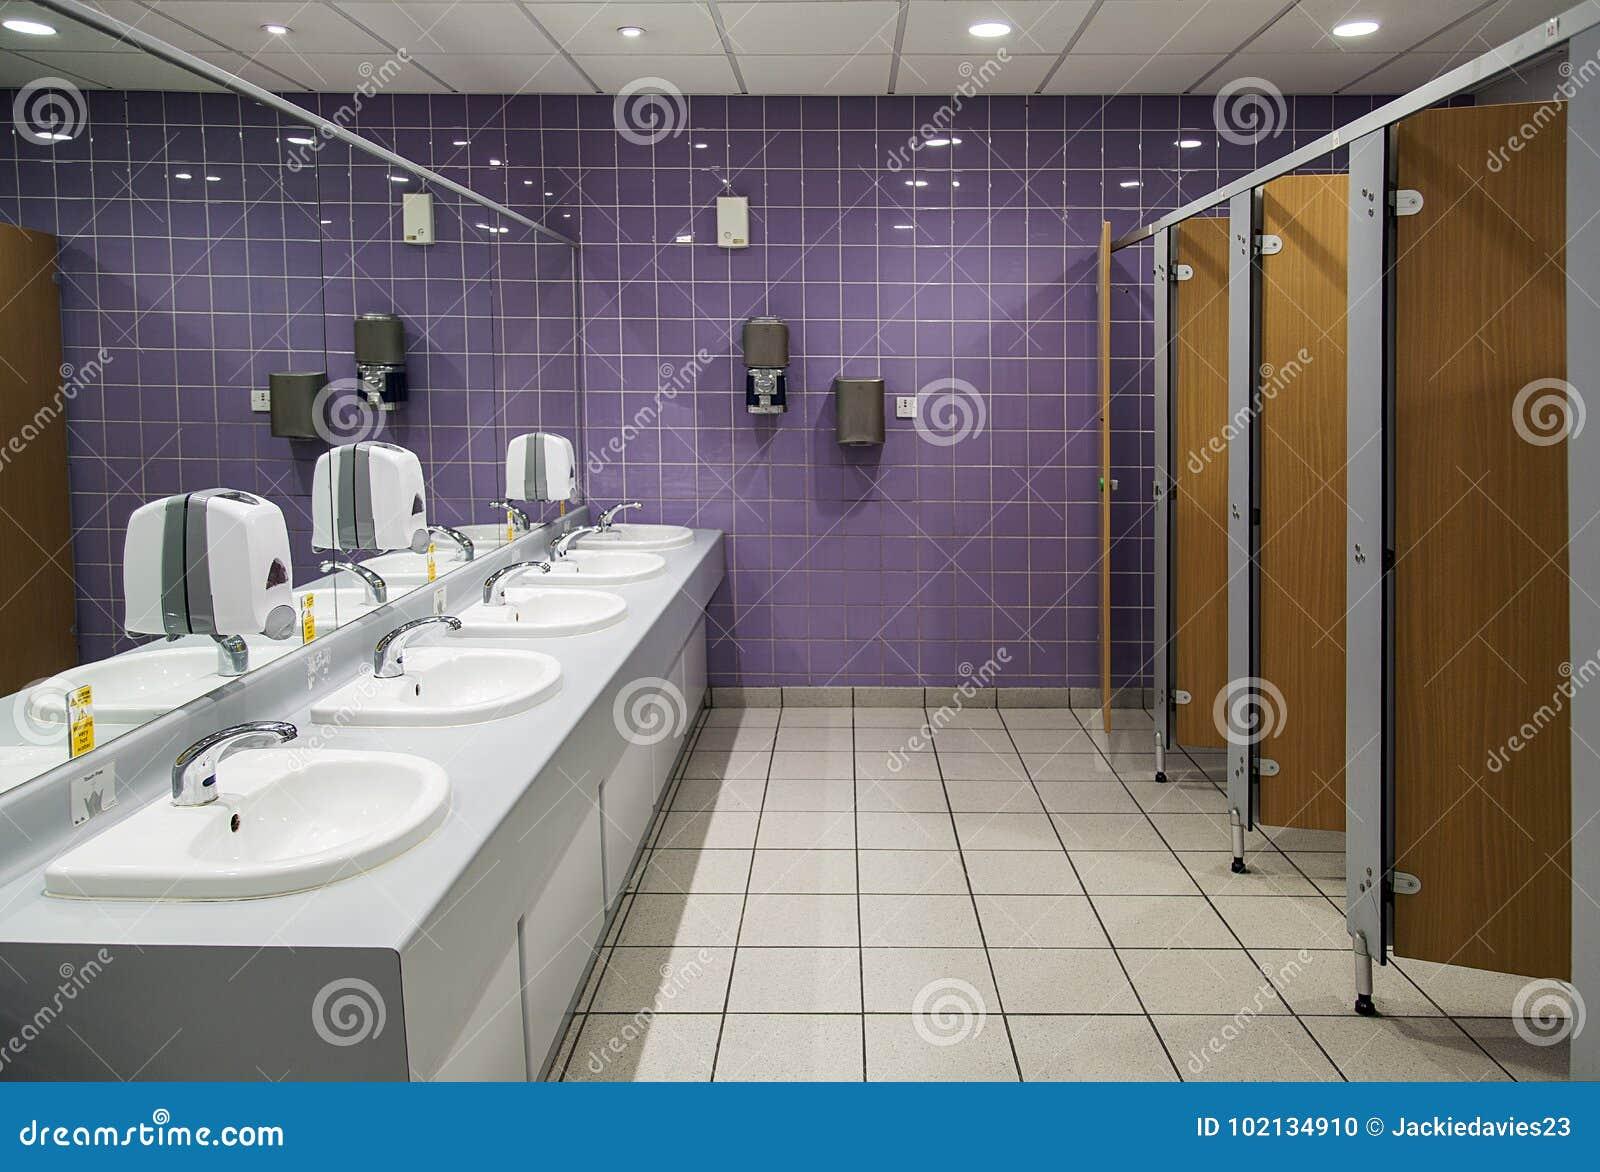 Public bathroom mirror Advertising Public Bathroom With Mirrors Cubicles And Sink Units Dreamstimecom Public Bathroom Stock Photo Image Of Handbasin Mirror 102134910